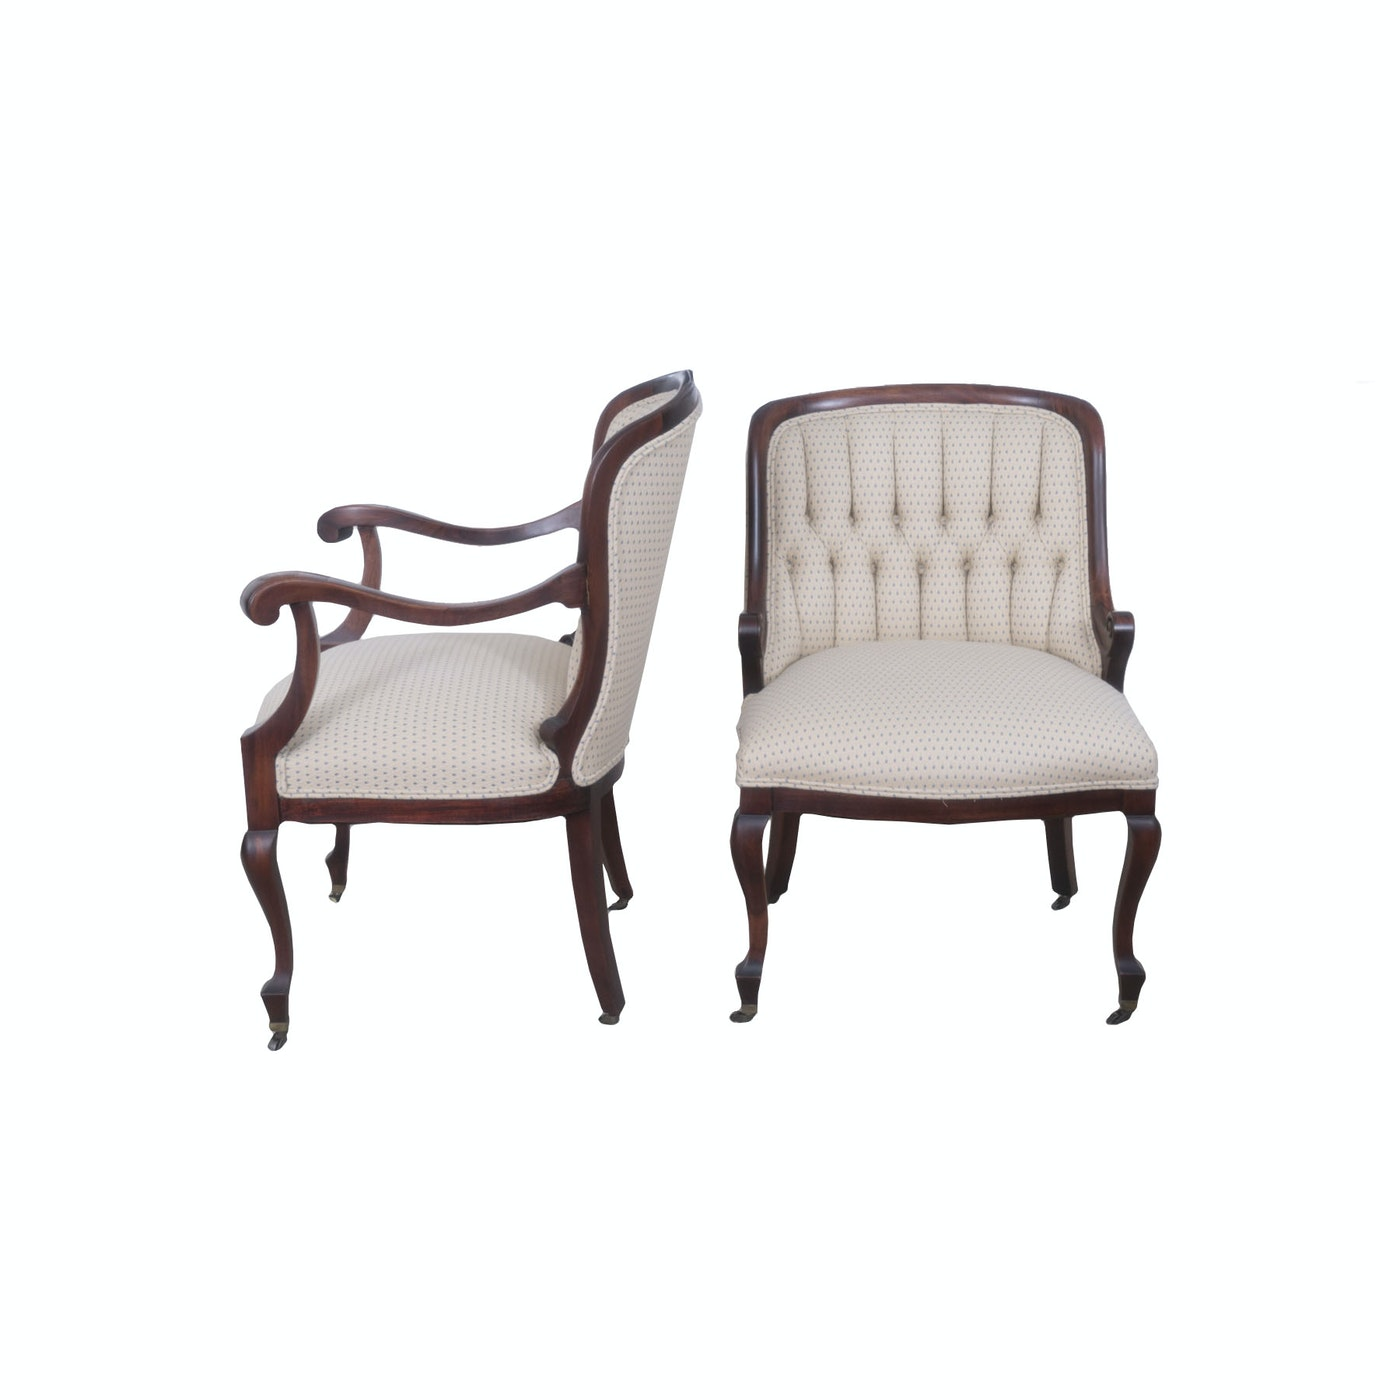 Regency style mahogany upholstered chairs ebth for Styles of upholstered chairs